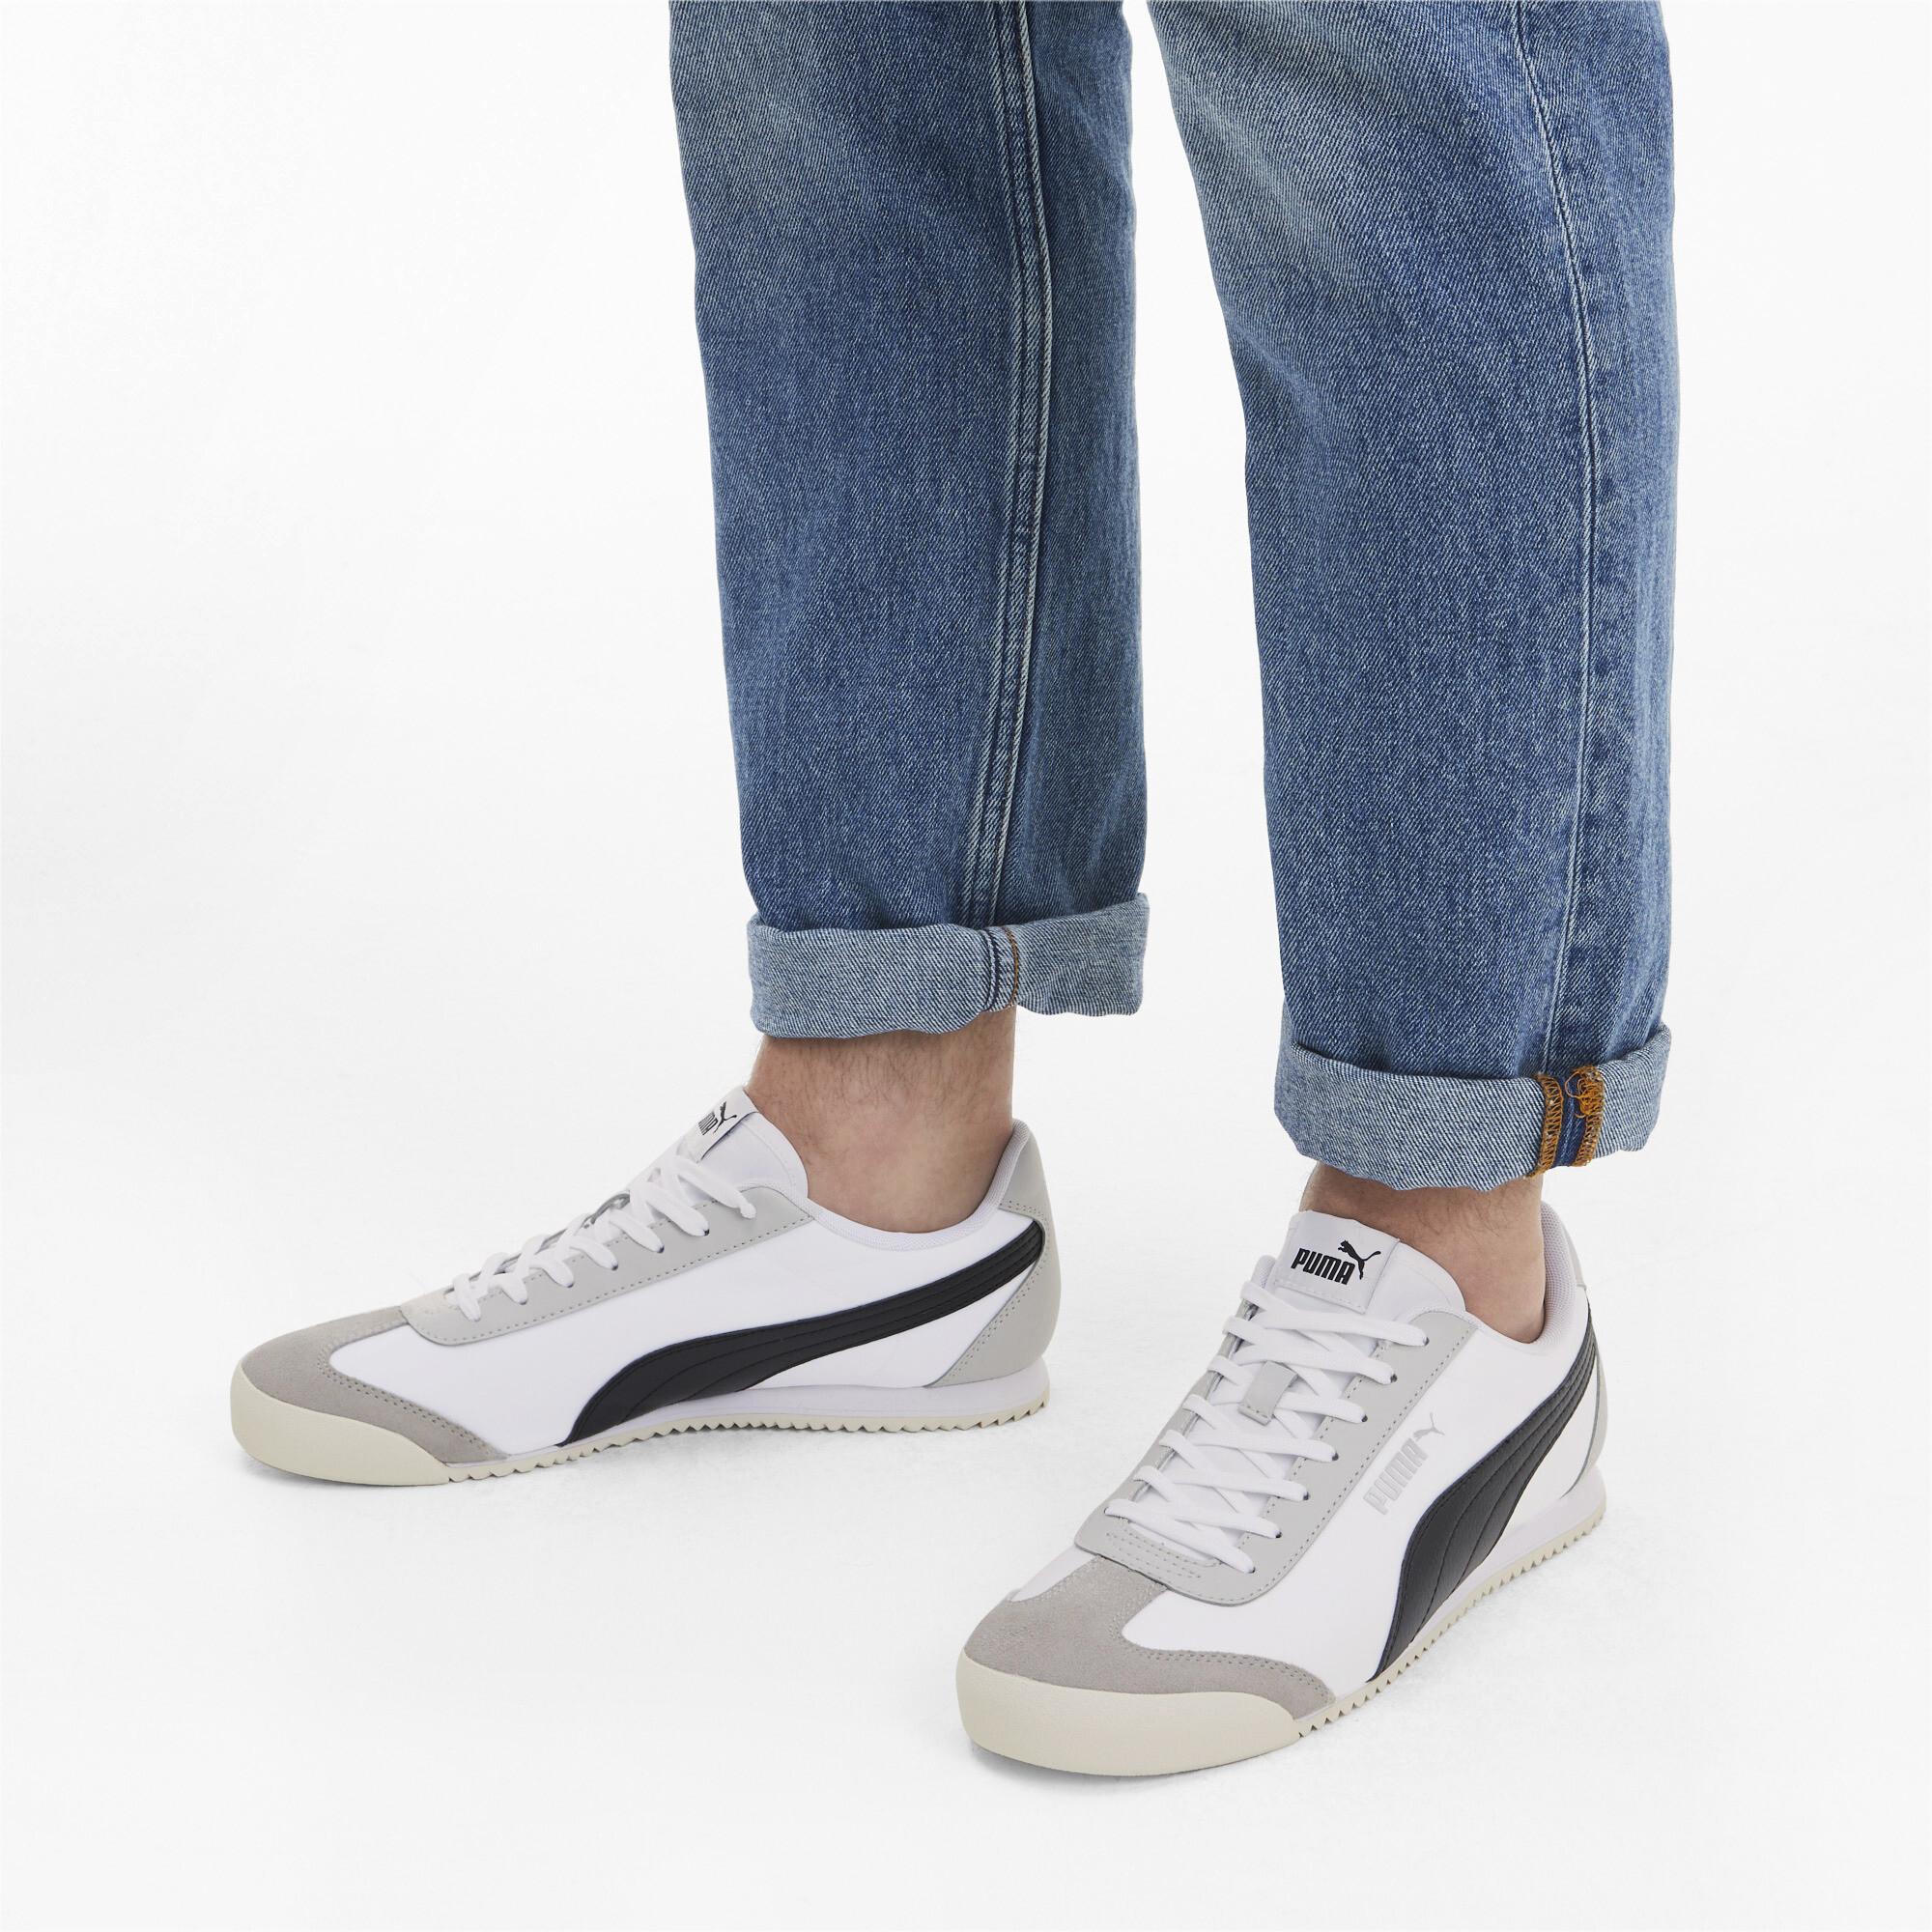 PUMA-Men-039-s-Turino-NL-Sneakers thumbnail 5